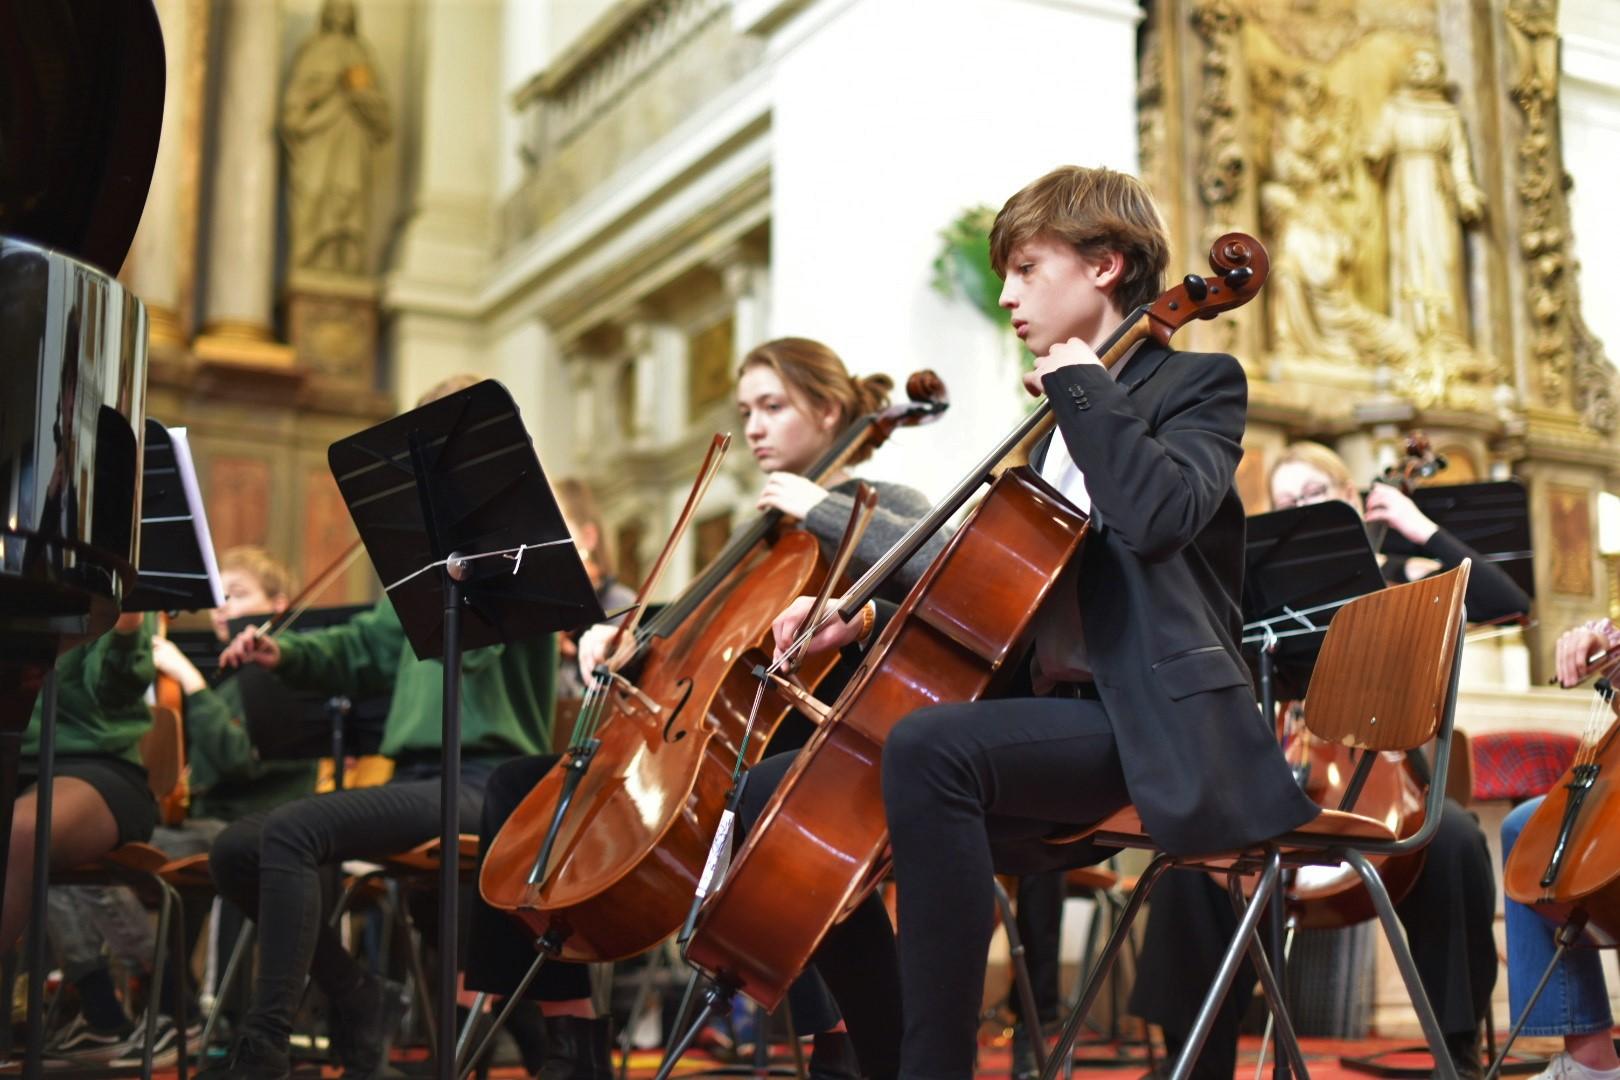 Orkesttournee 2020: Musique sans Frontières GEANNULEERD